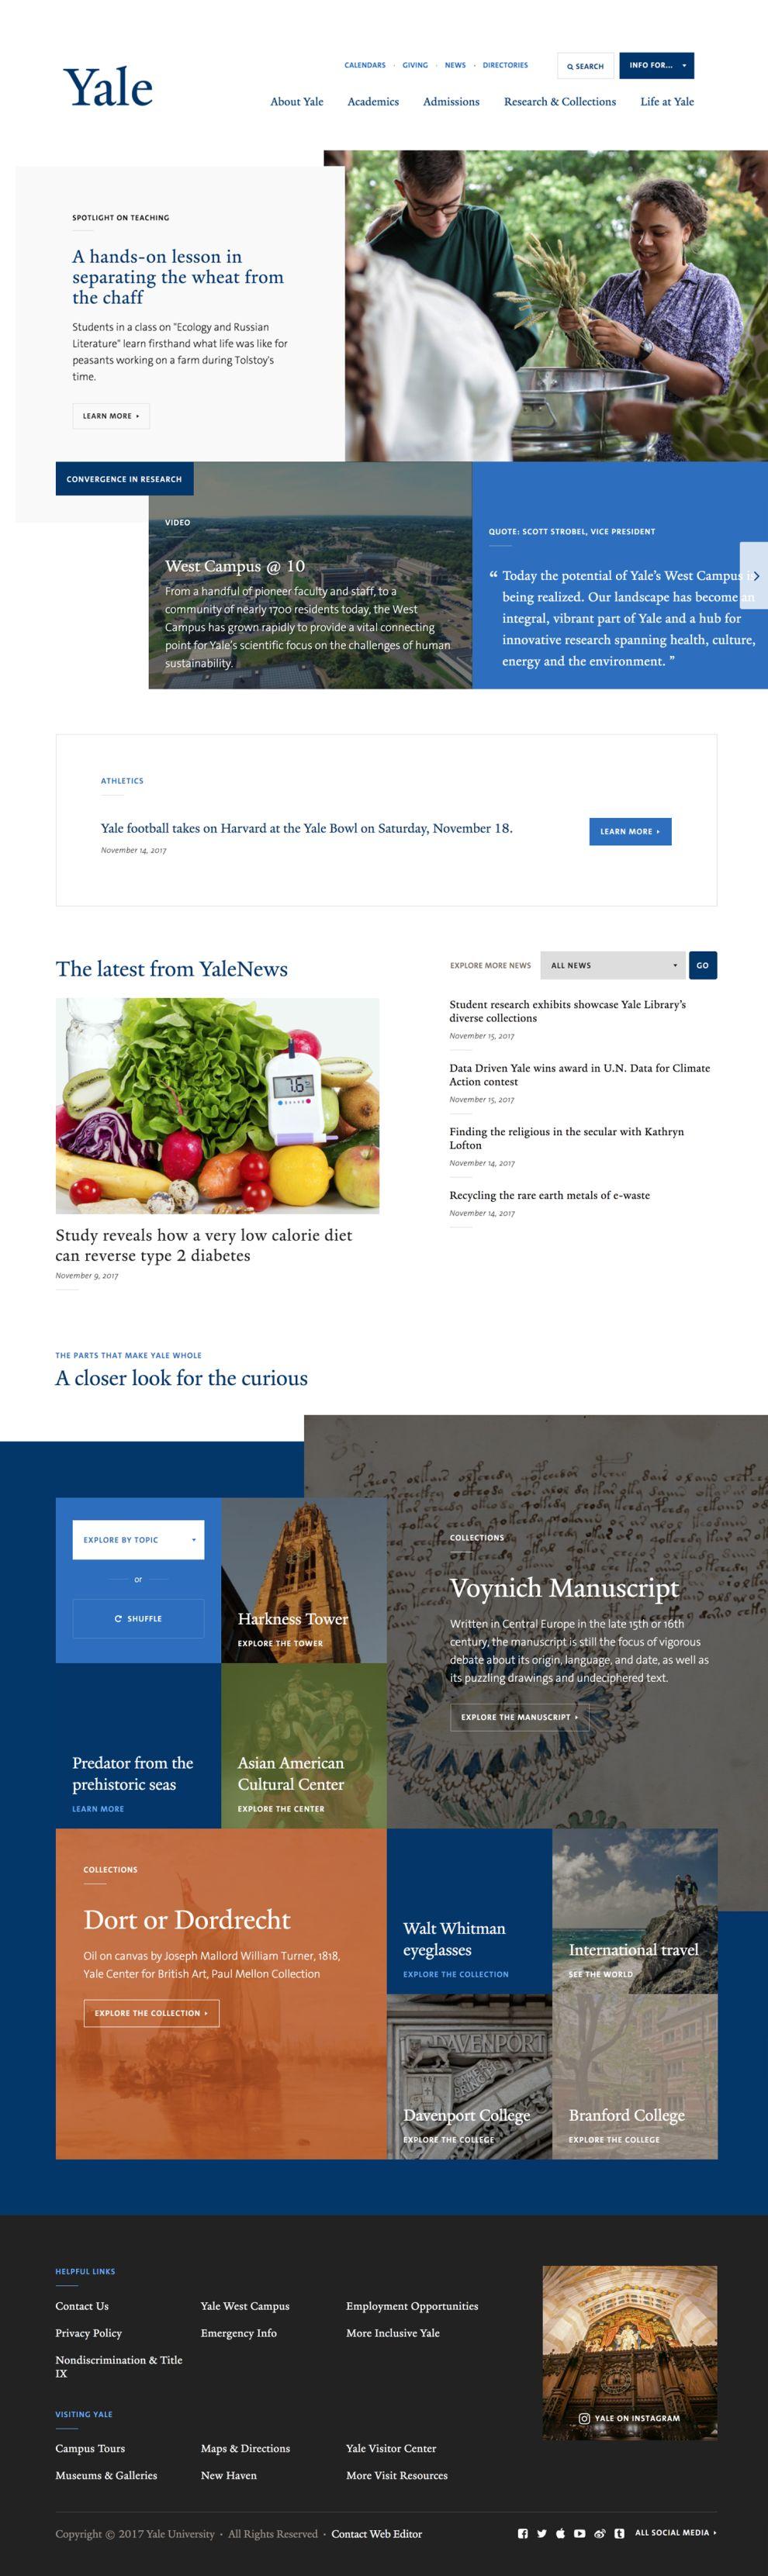 Yale University Professional Homepage